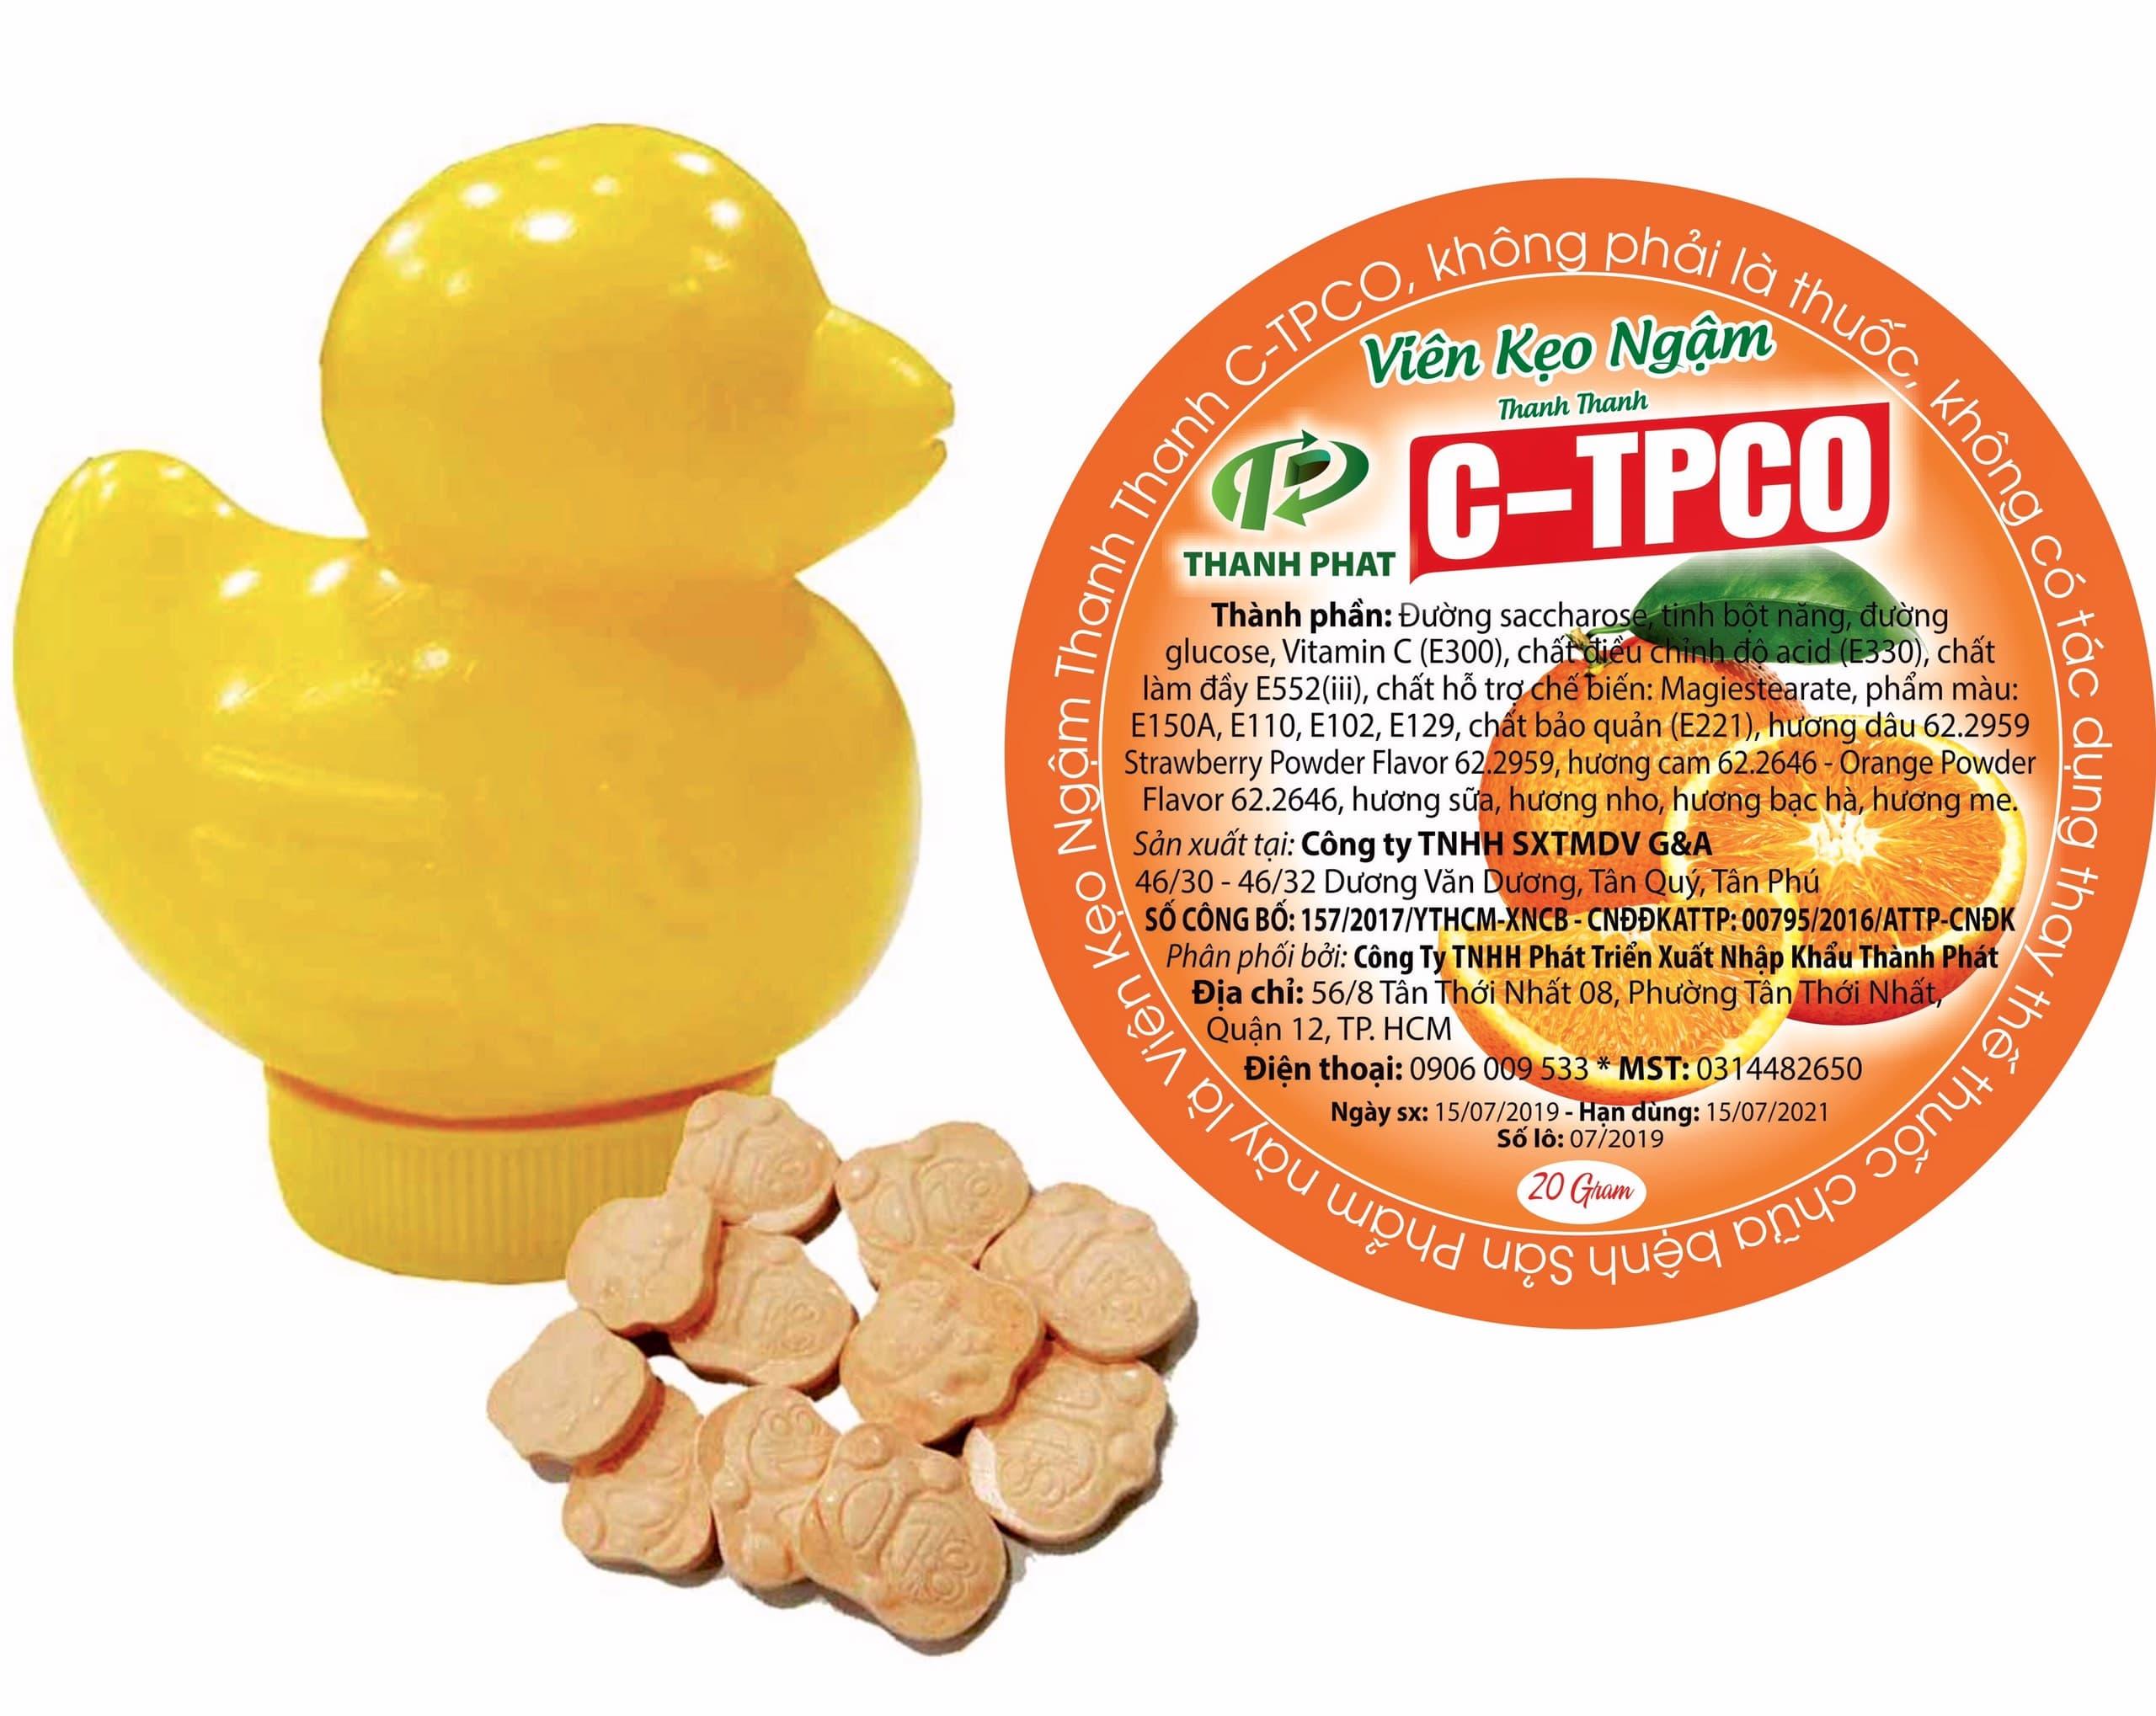 Kẹo Viên Ngậm C-TPCO